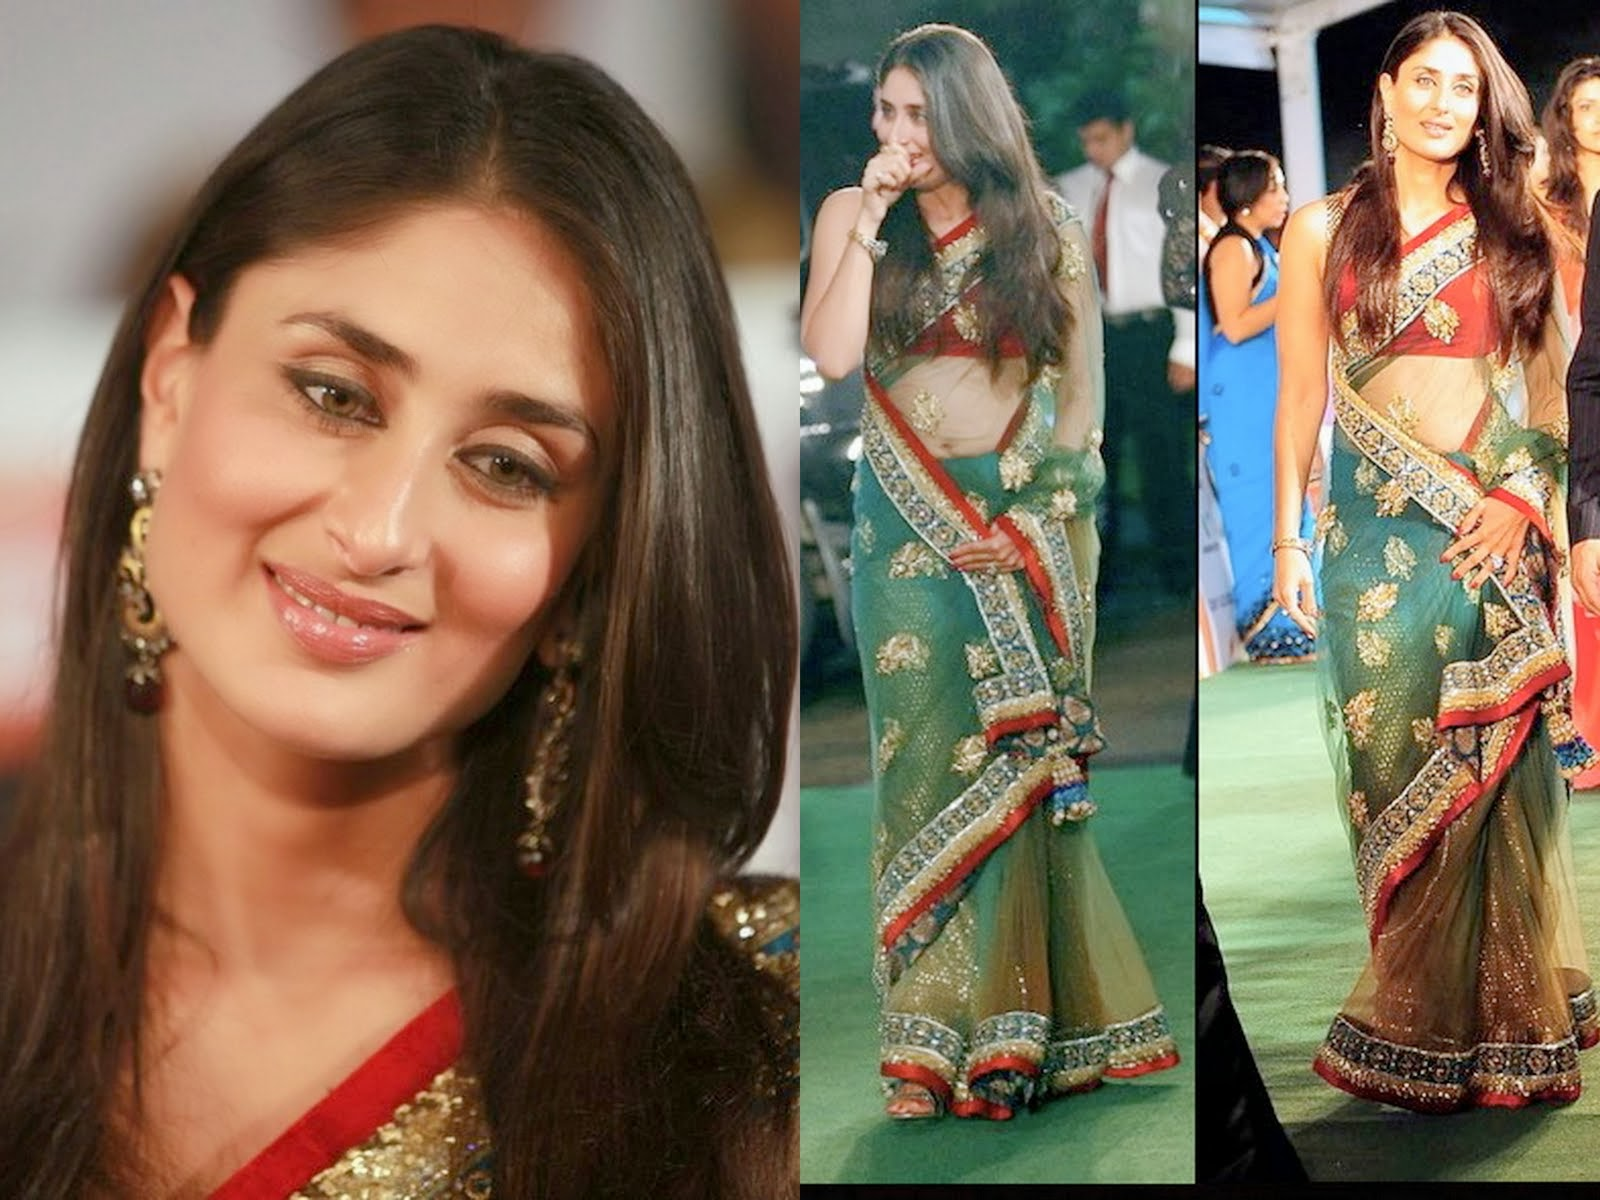 5bea391613 Kareena Kapoor welcomes Diwali with Saif Ali Khan, her friends and a ...